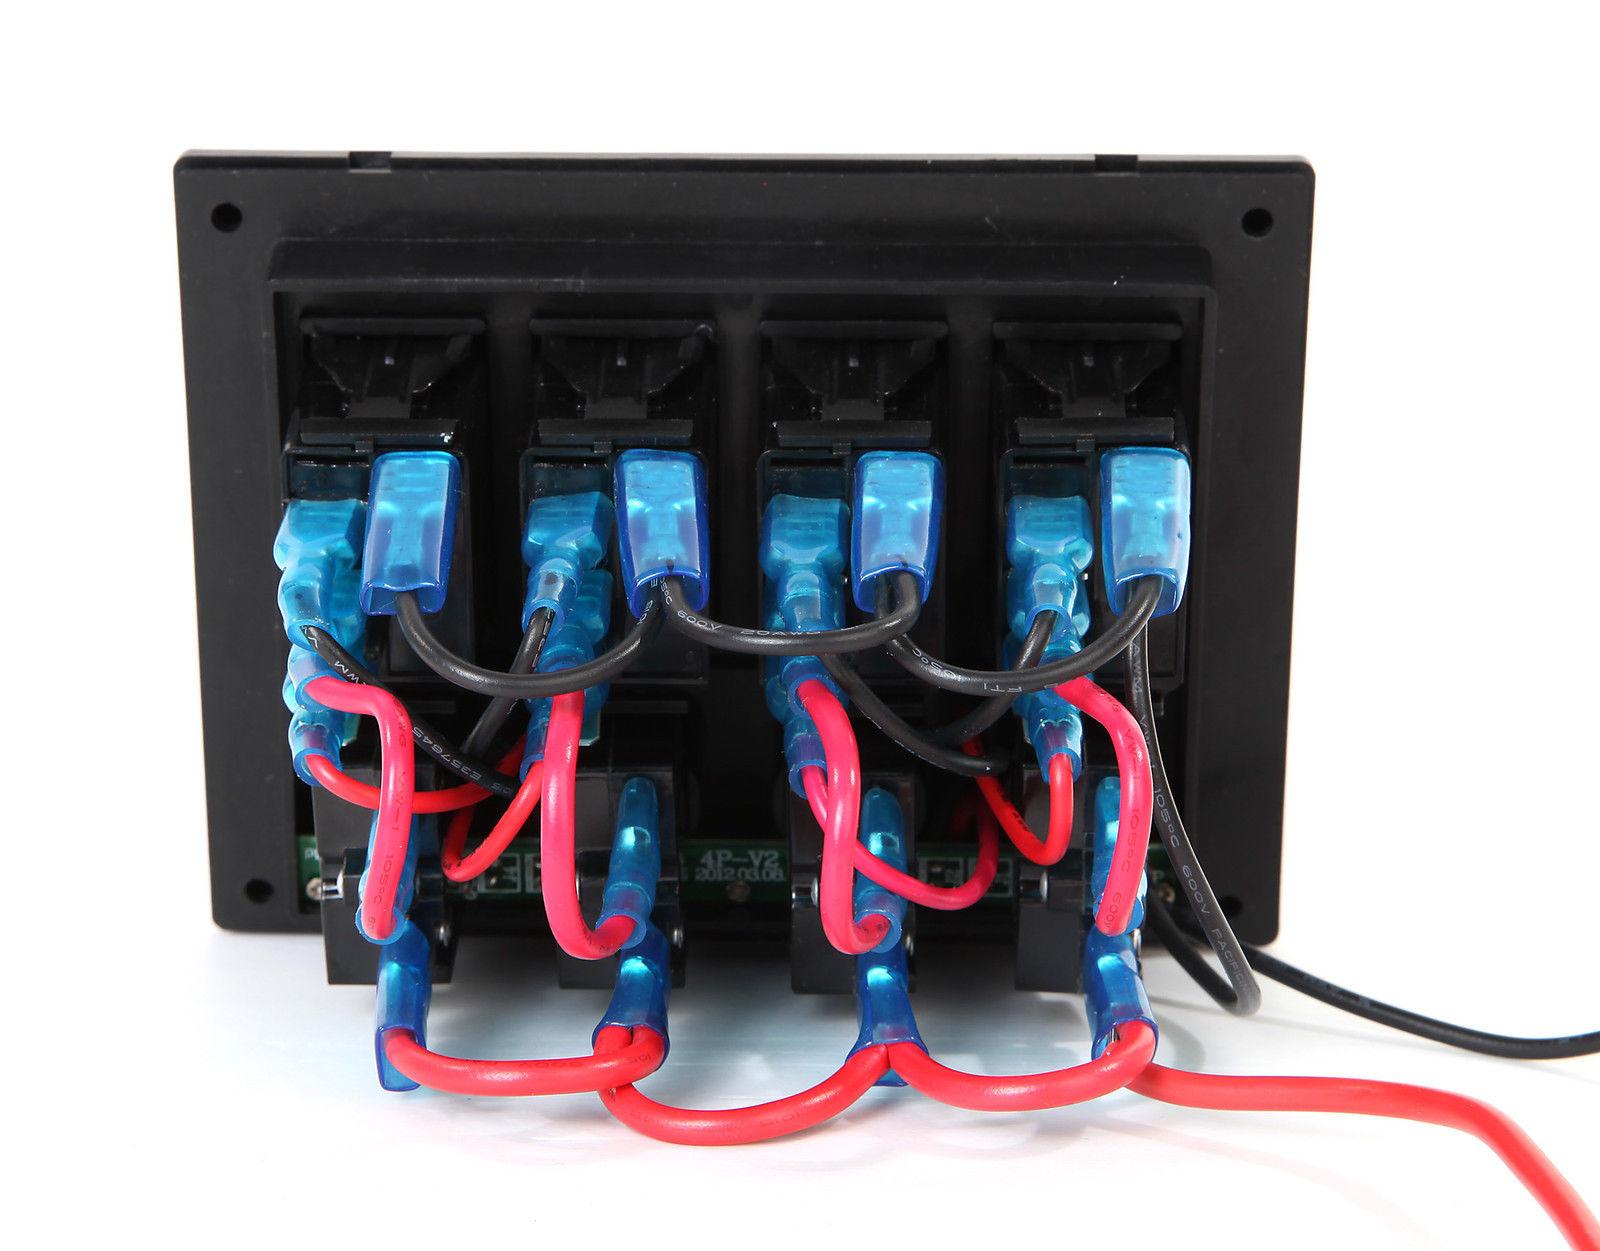 Wiring Rocker Switch Panel Wire Center Painless Marine Boat Rv 4 Gang Waterproof W Led Rh Pactrademarine Com Pin